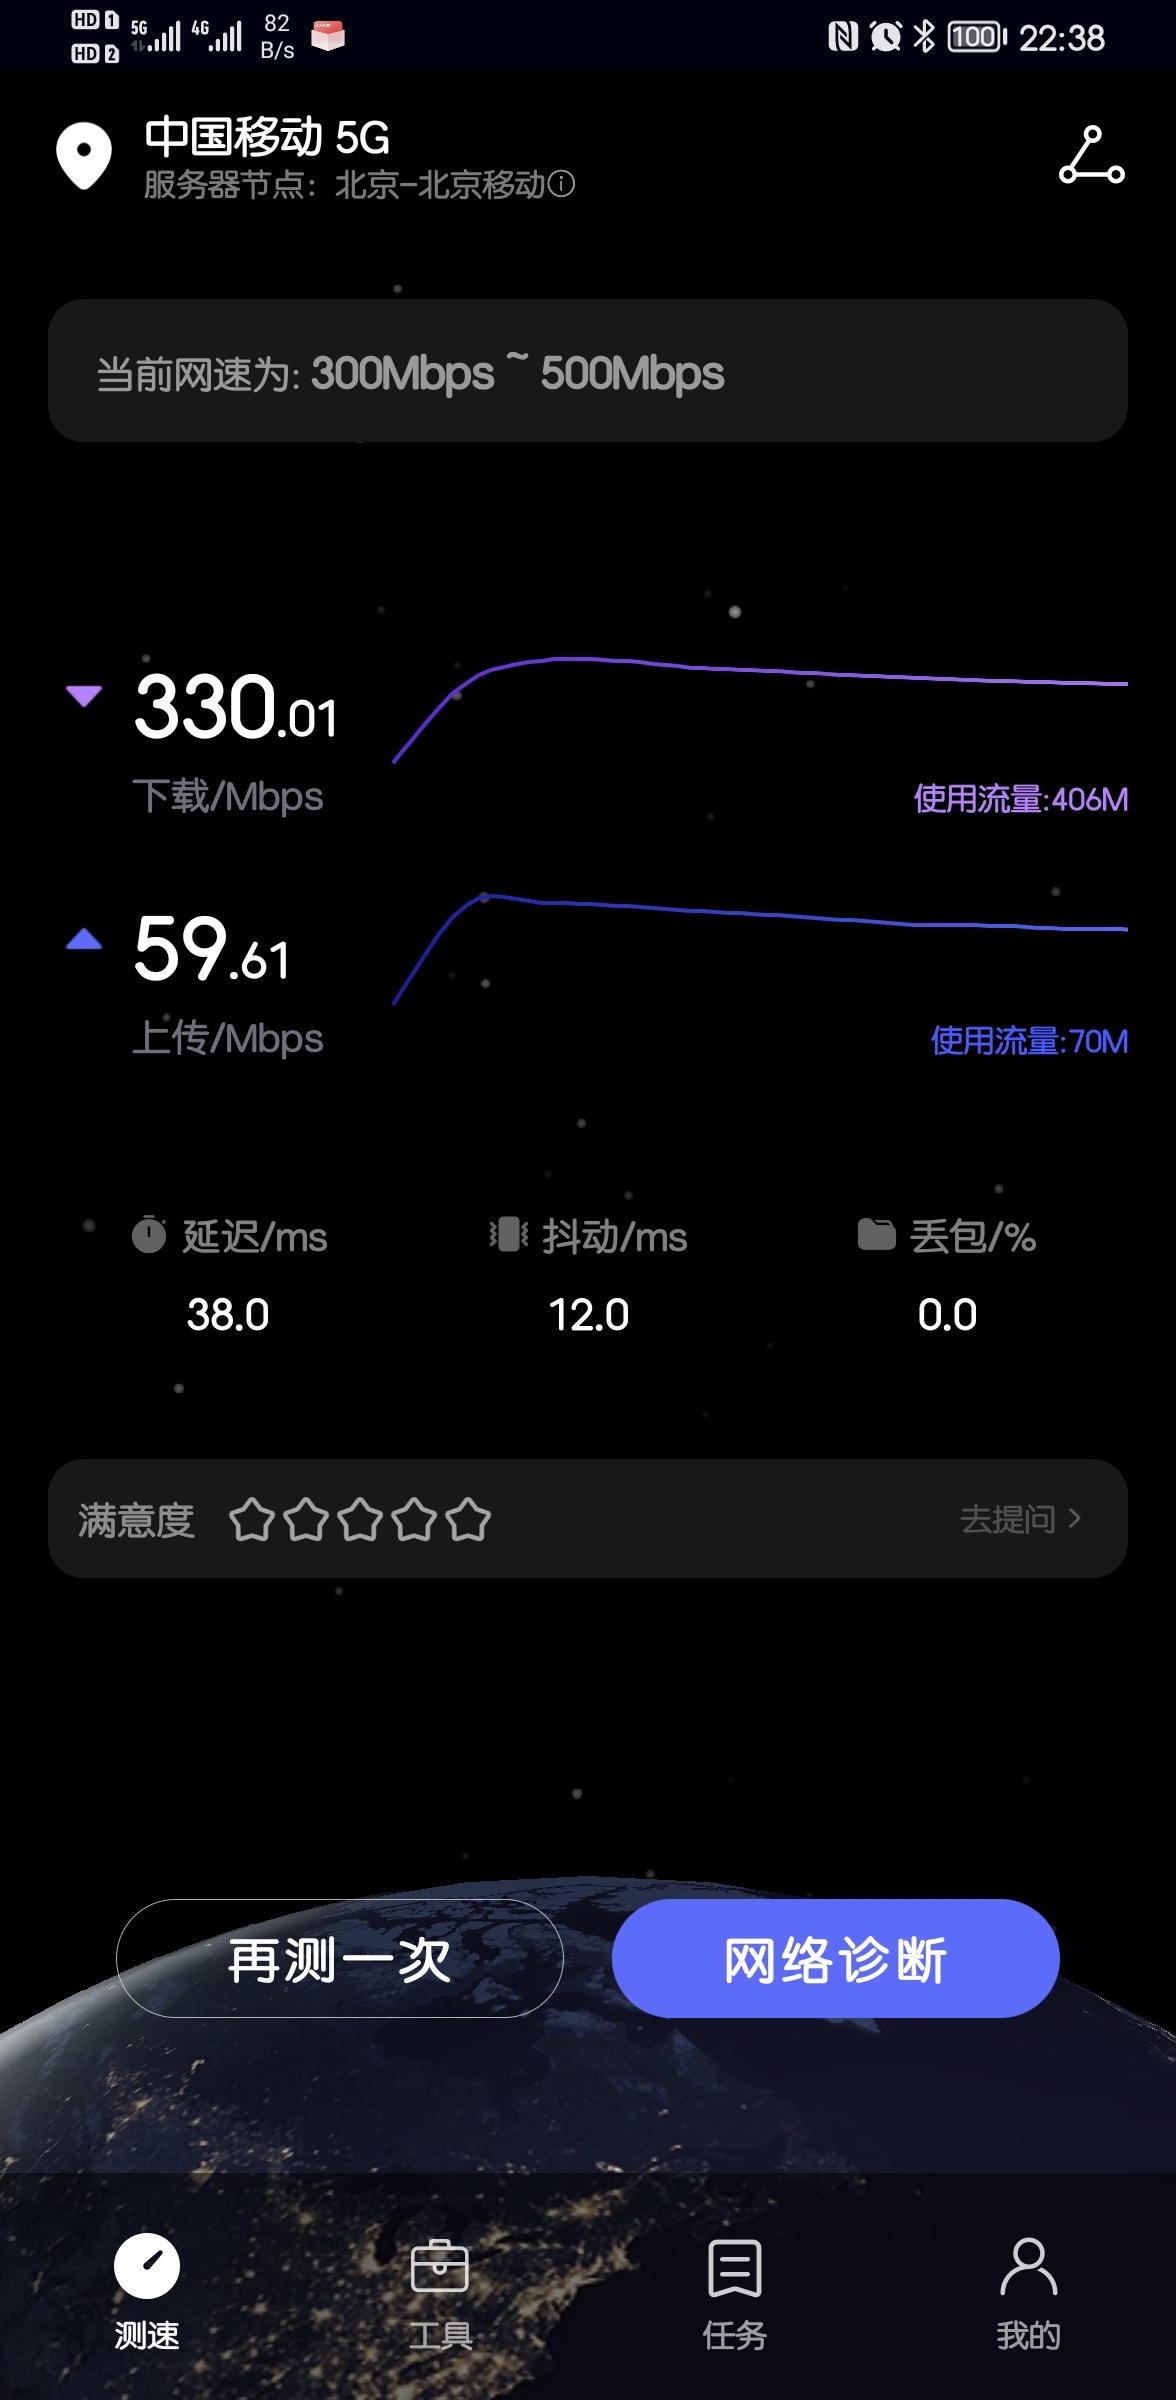 Screenshot_20210925_223830_com.huawei.genexcloud.speedtest.jpg